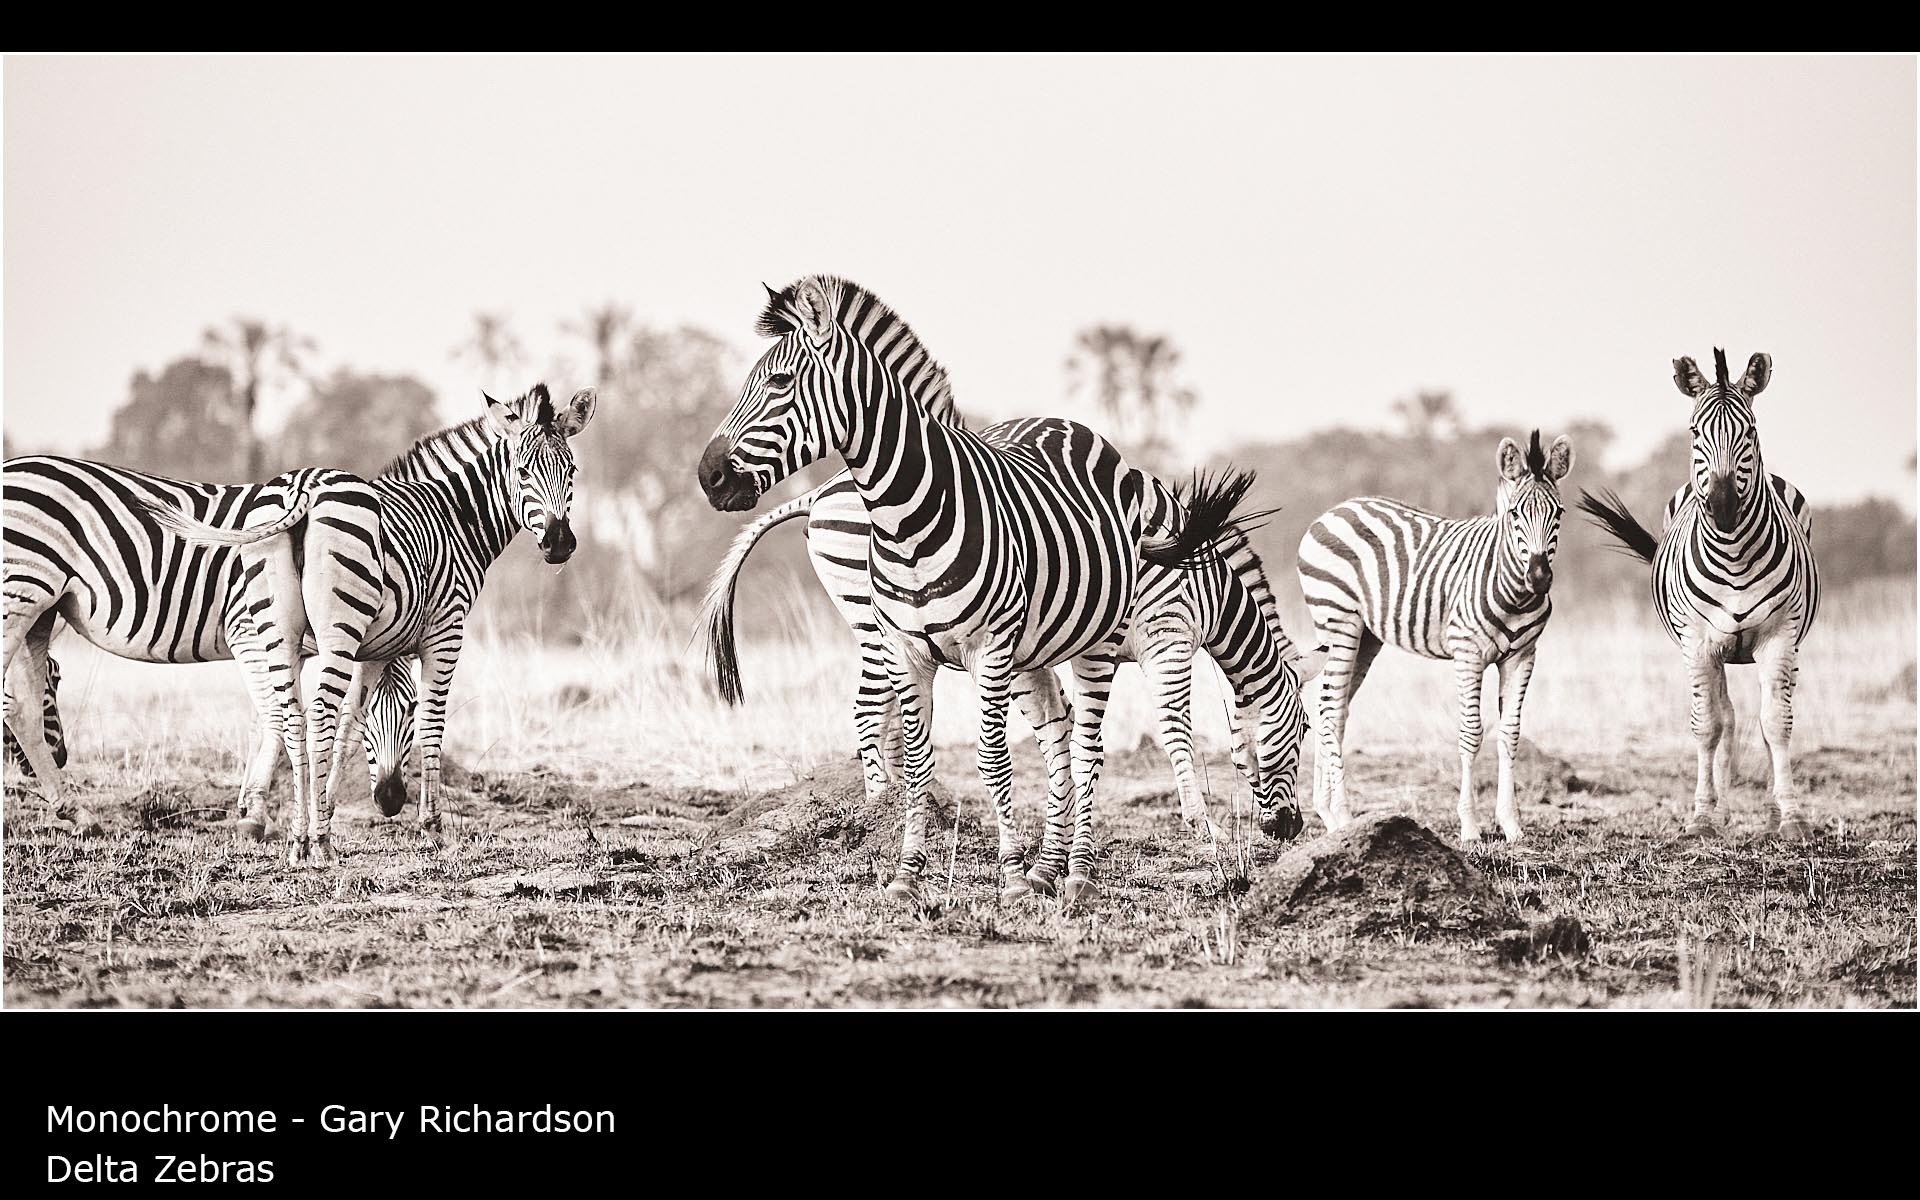 Delta Zebras - Gary Richardson